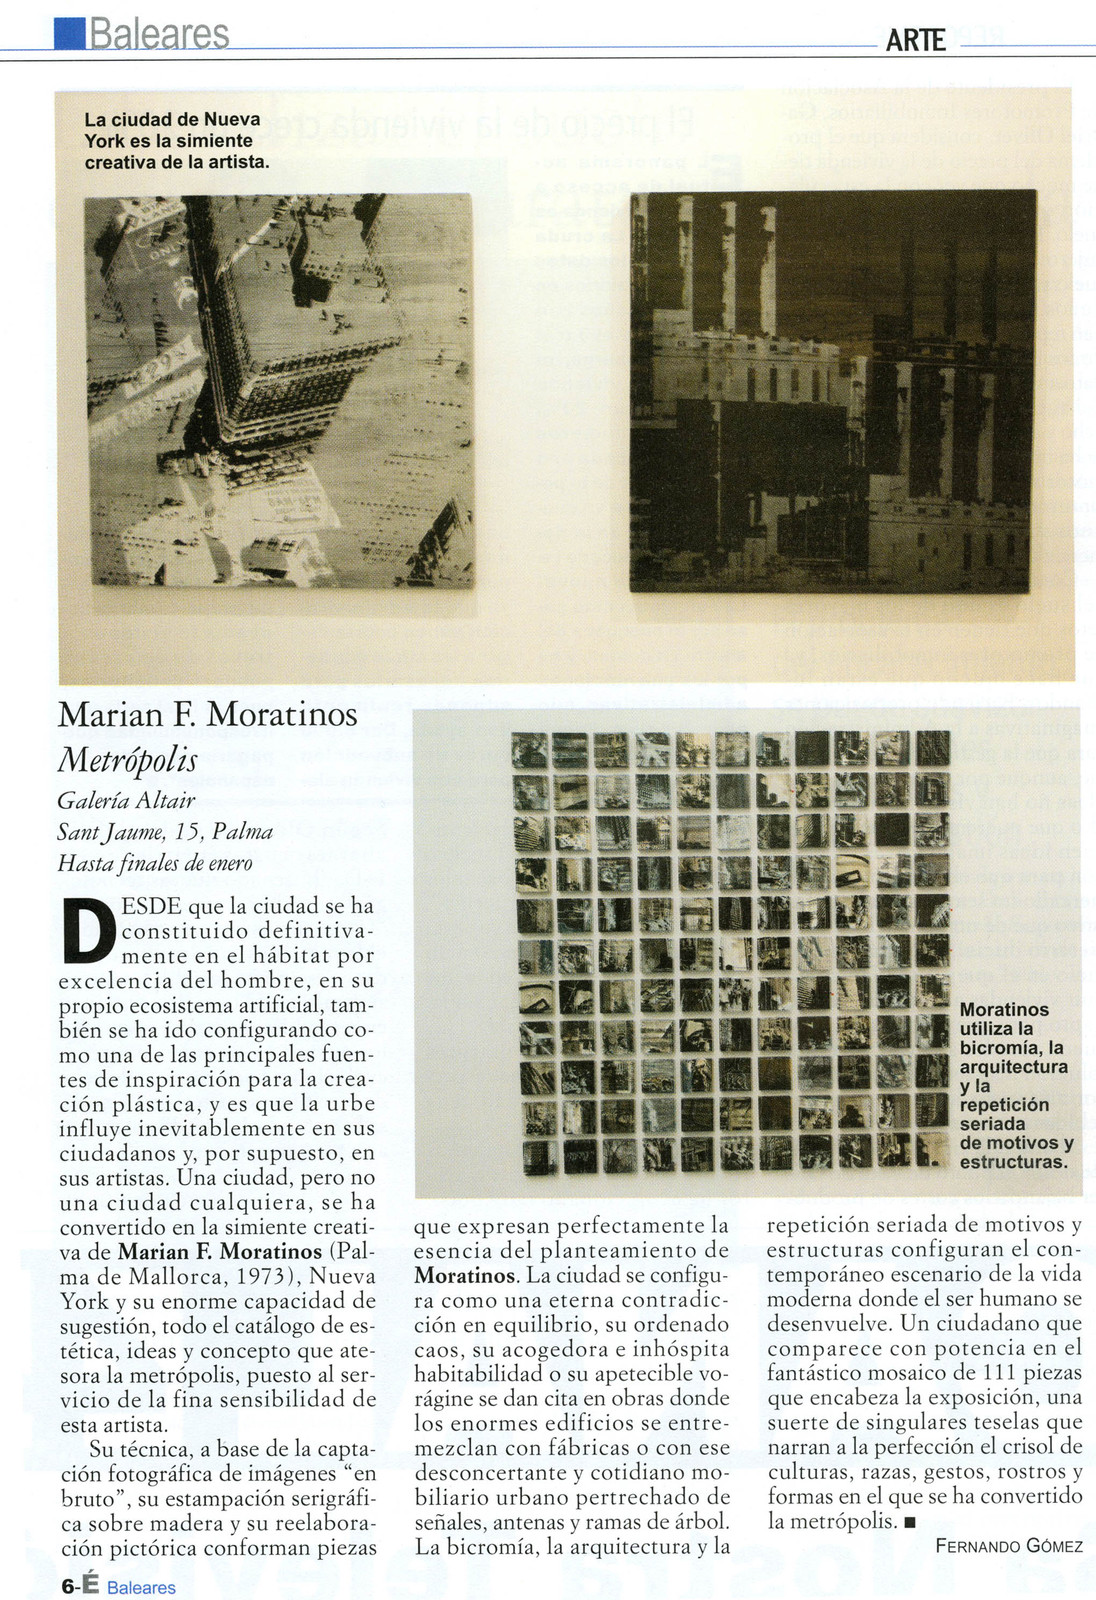 Marian Moratinos: Metrópolis